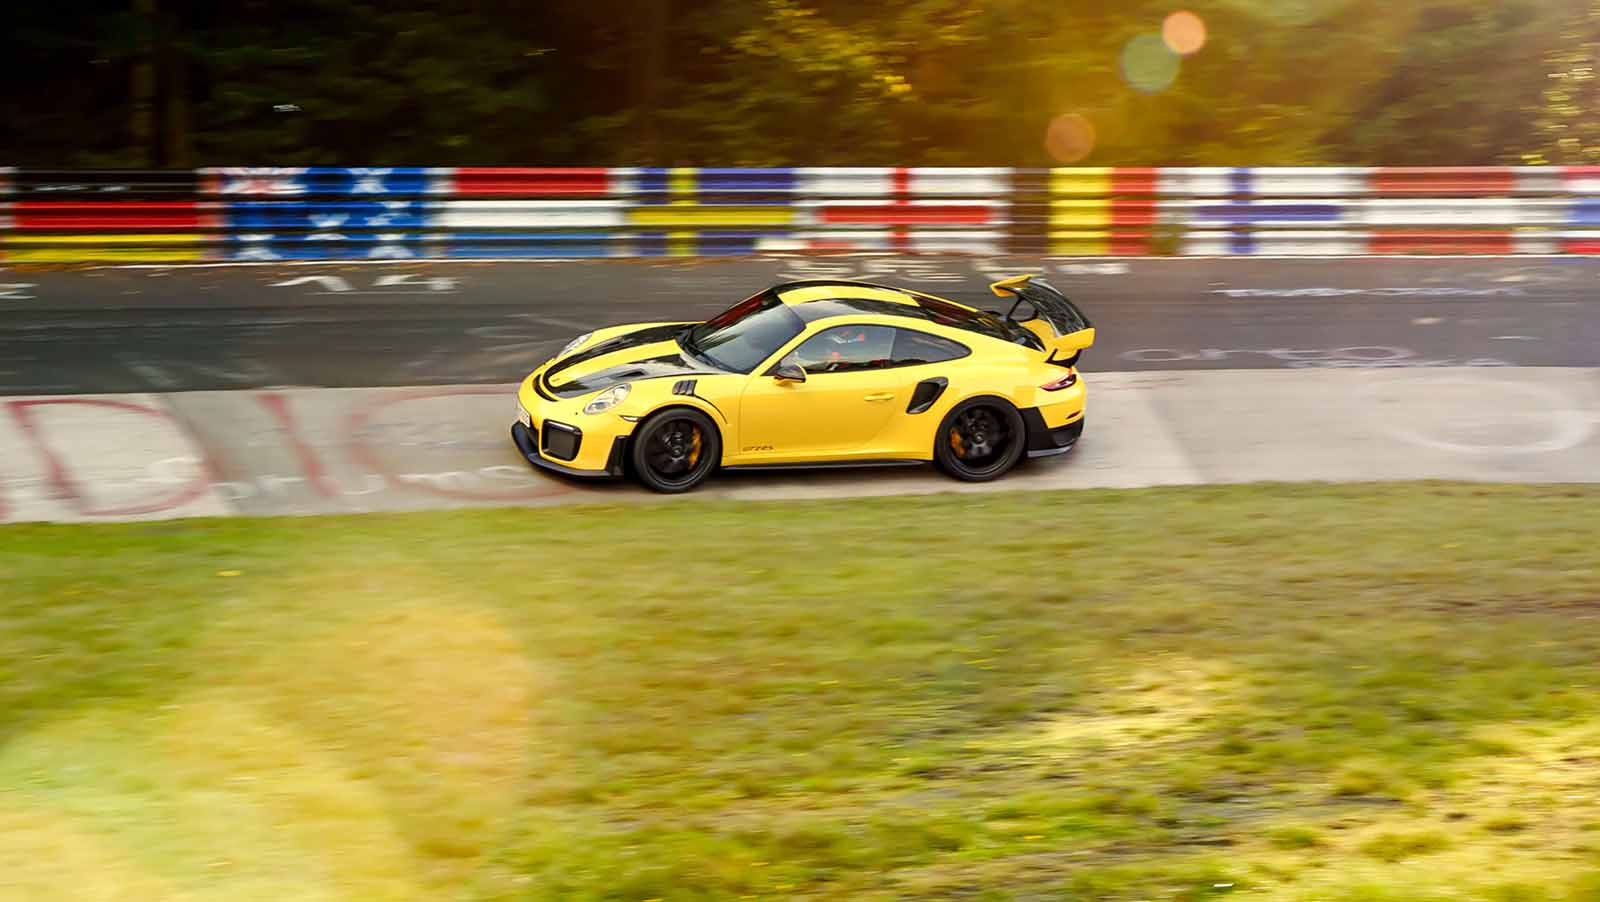 Porsches are Better Than Lamborghinis